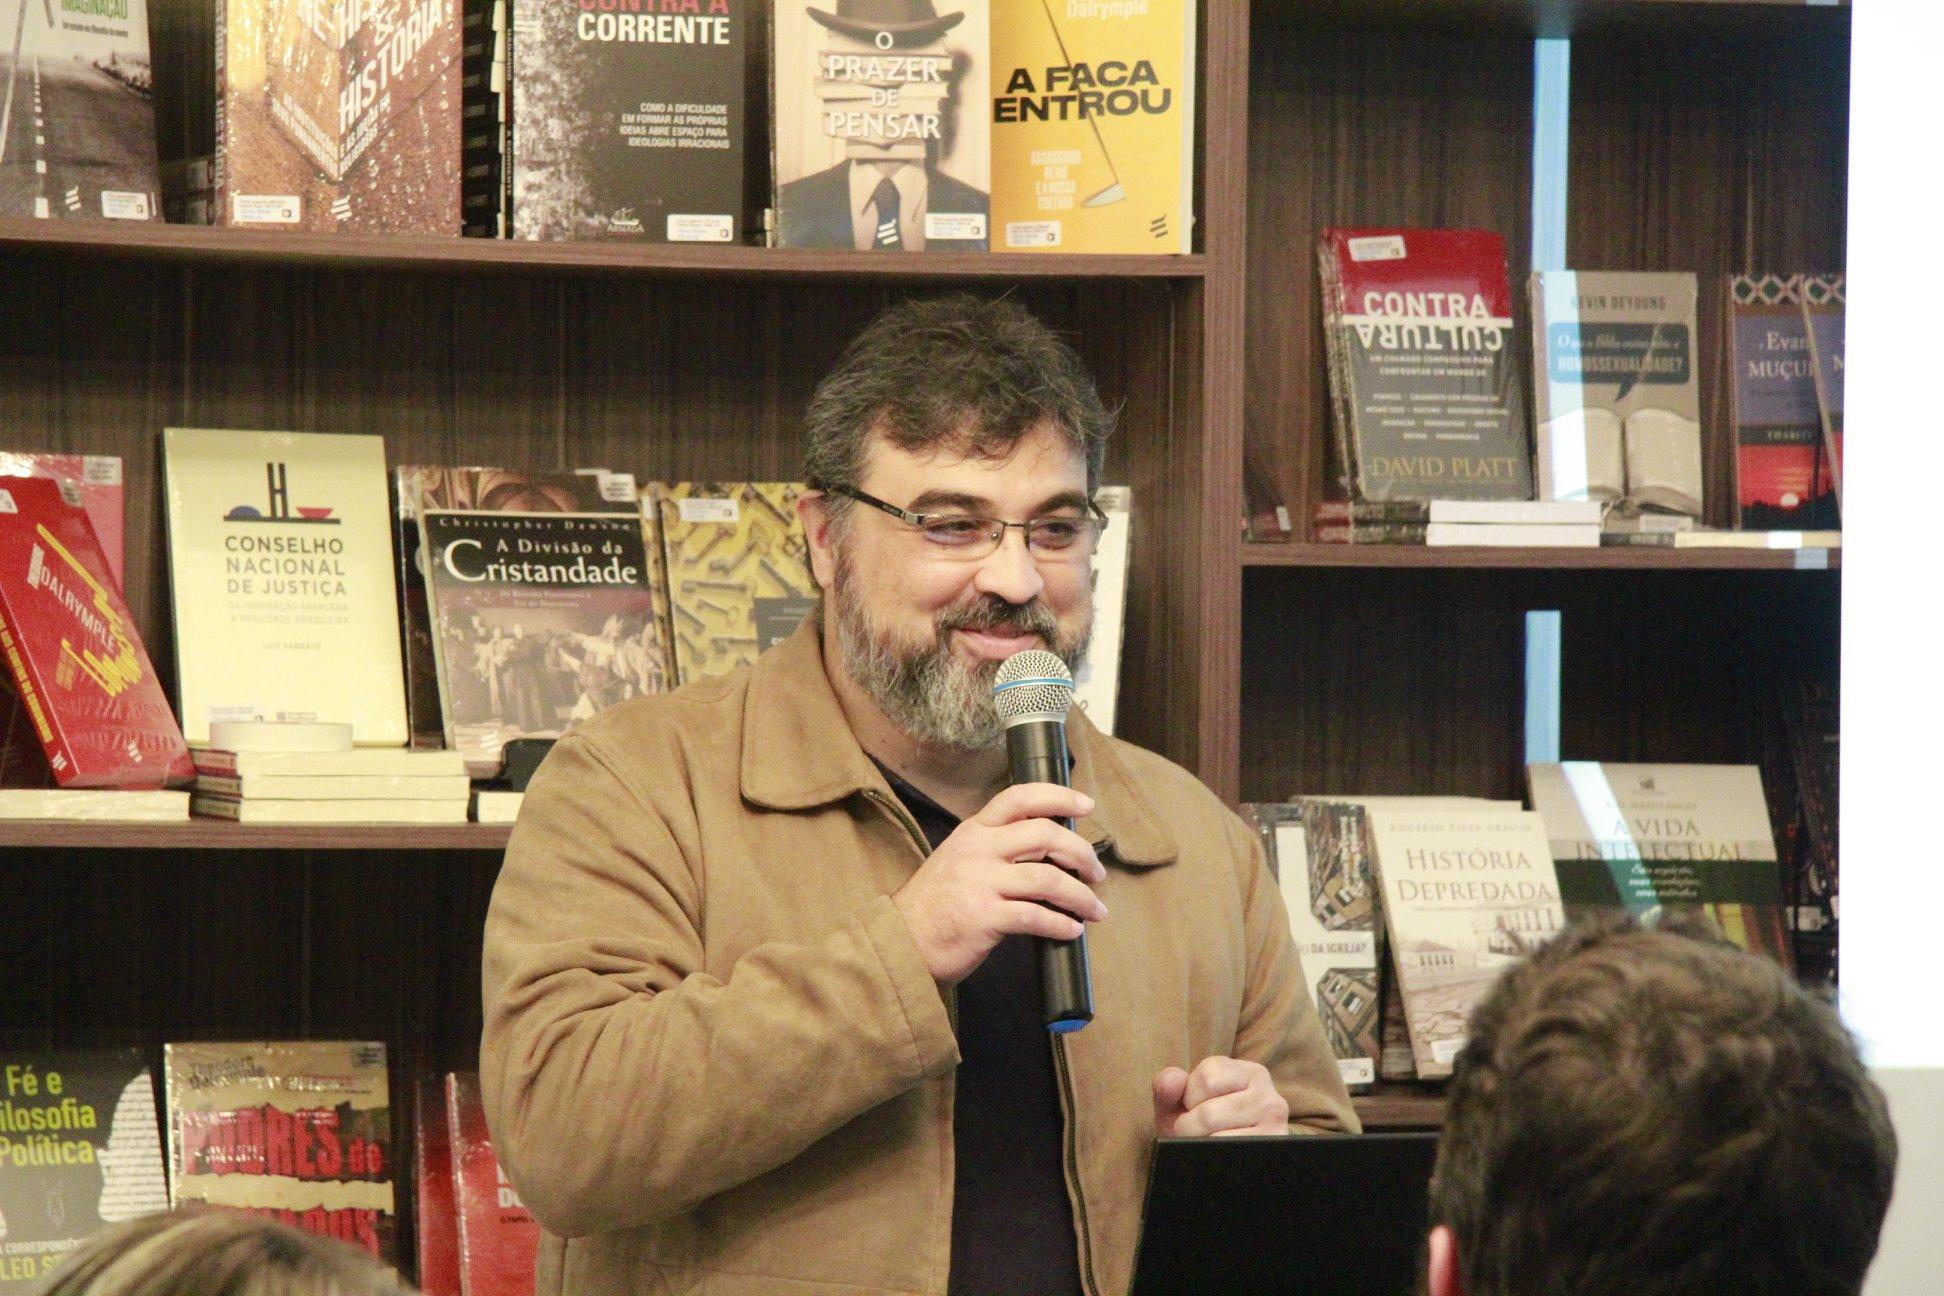 Alexandre Oliveira